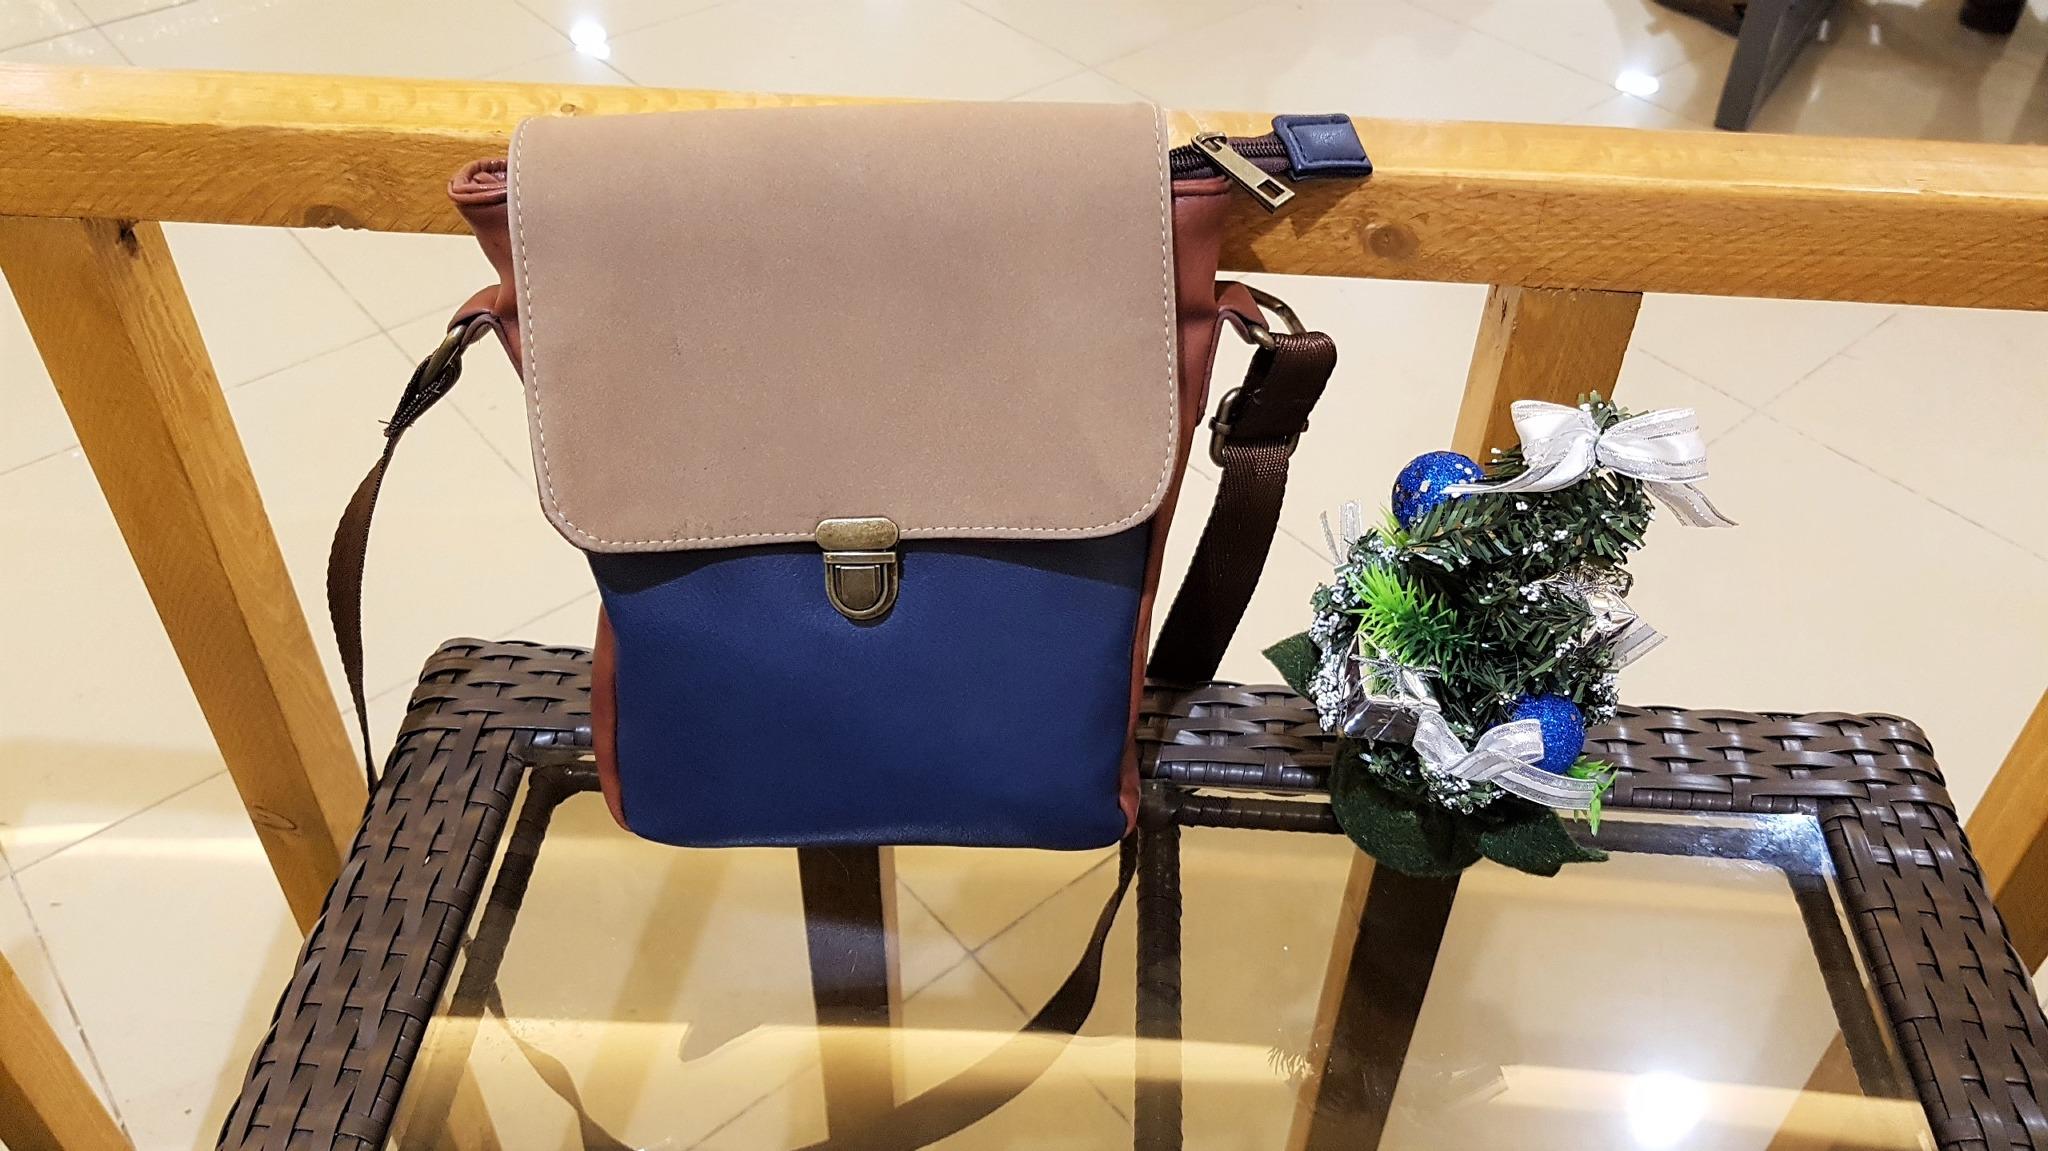 MSense Affordable Mini Shoulder Bag for Guys – Pinoy Guy Guide 87105e22c0999